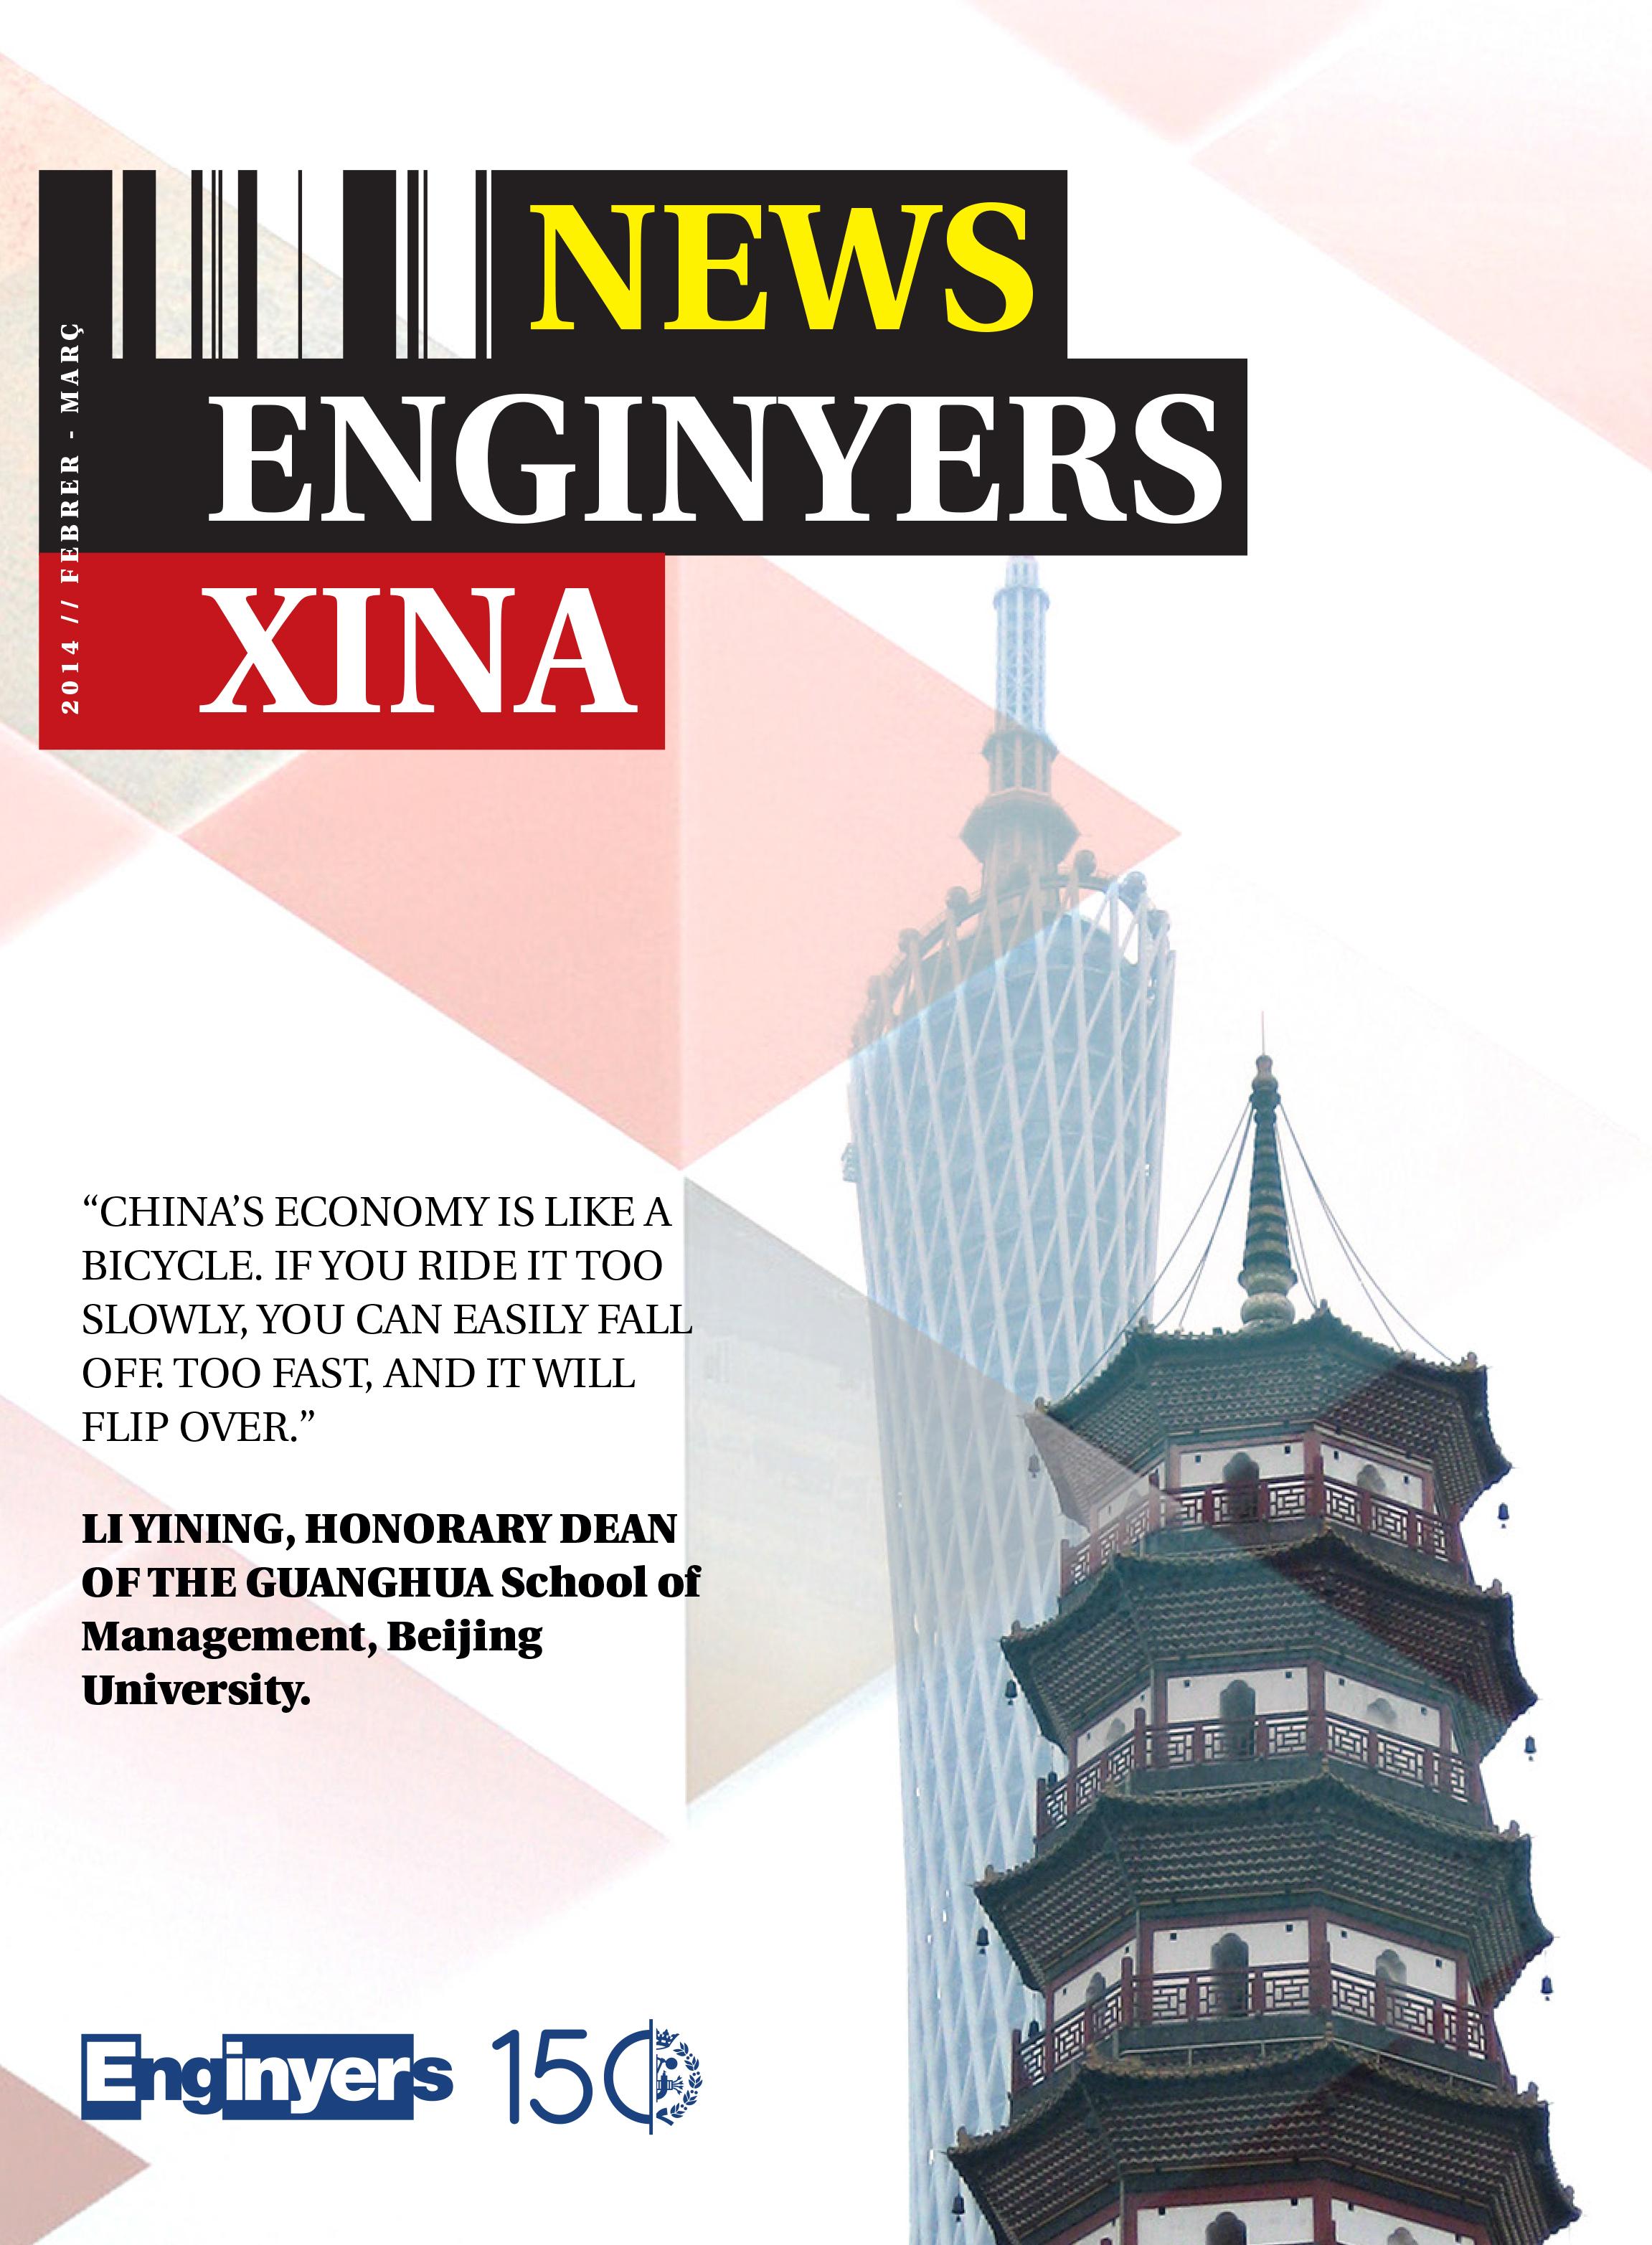 201411_news_enginyers_xina